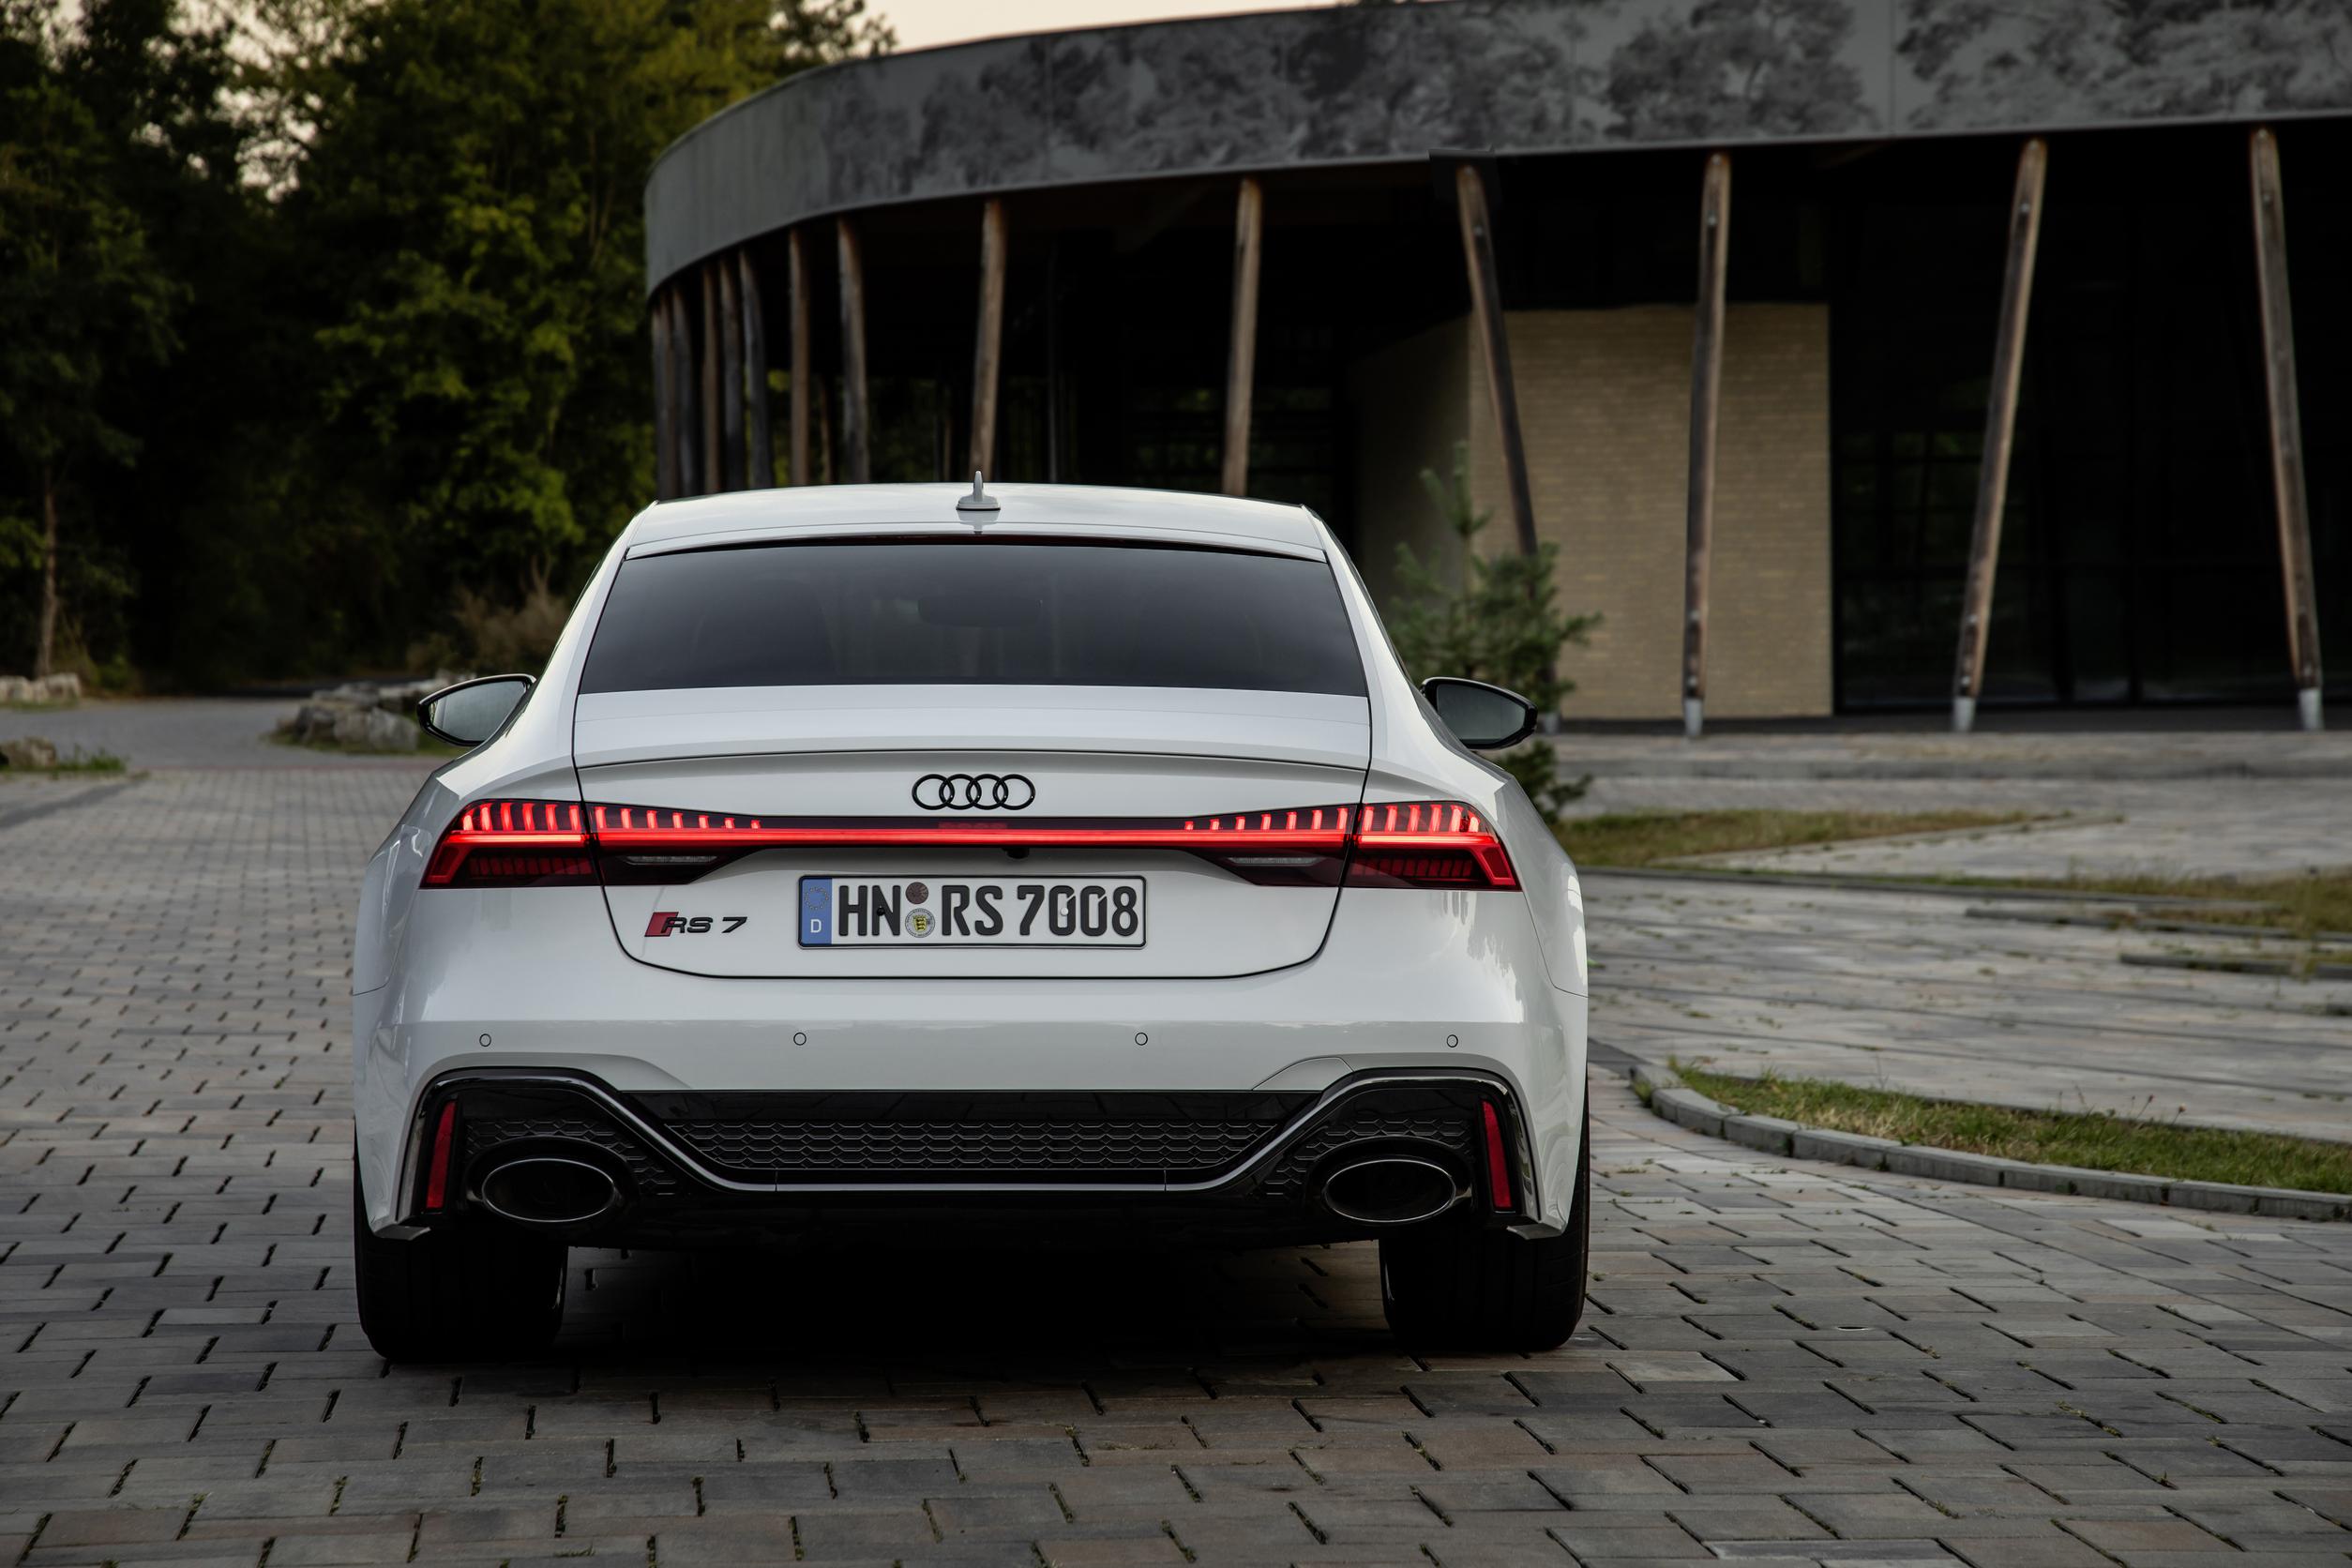 Fahrvorstellung Audi Rs 7 Sportback Www Rallye Magazin De